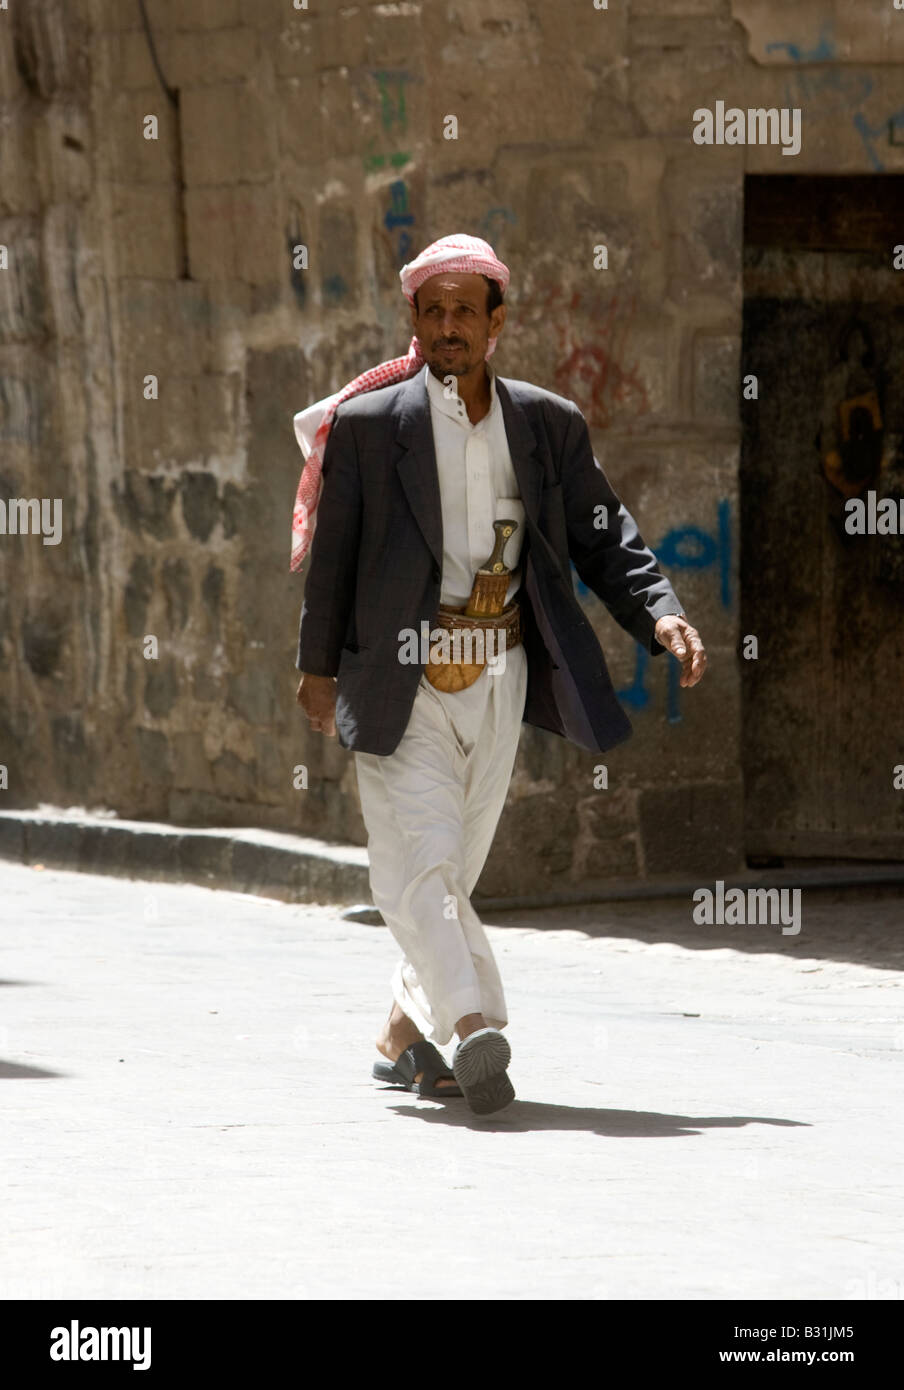 A old Muslim man from Yemen walking through Old Sanaa City wearing his traditional Jambiya dagger - Stock Image